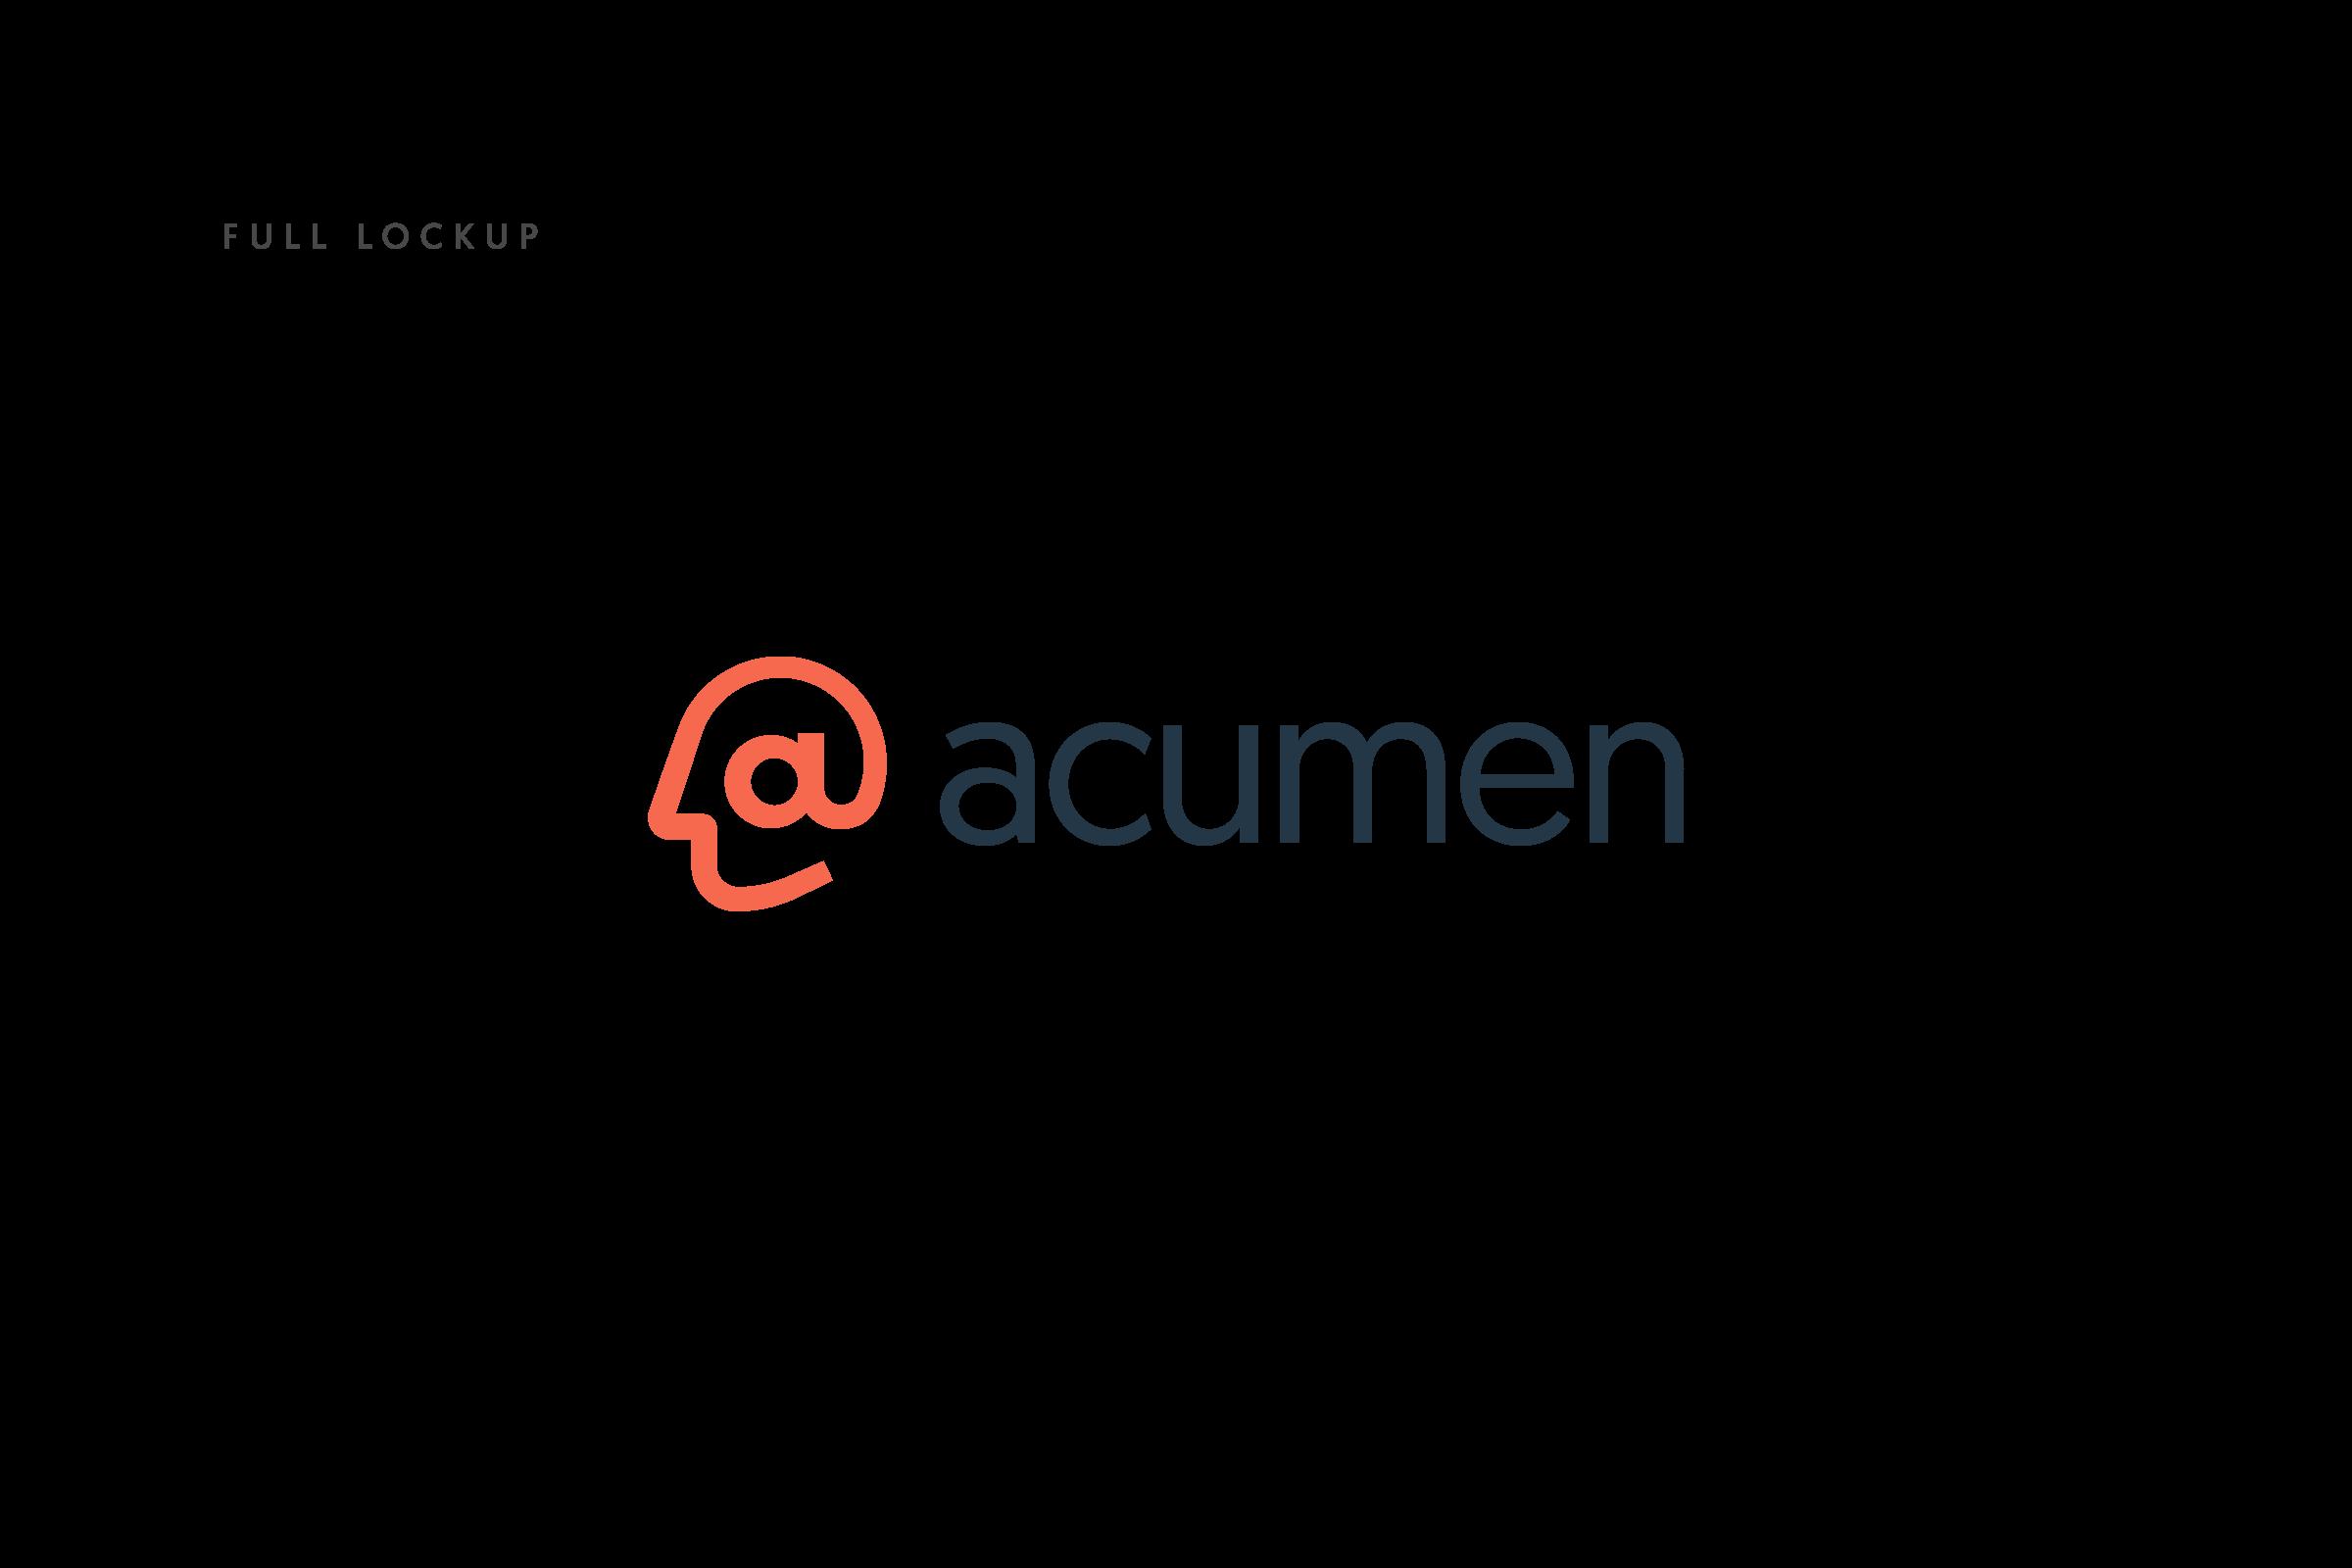 Standard Acumen logo